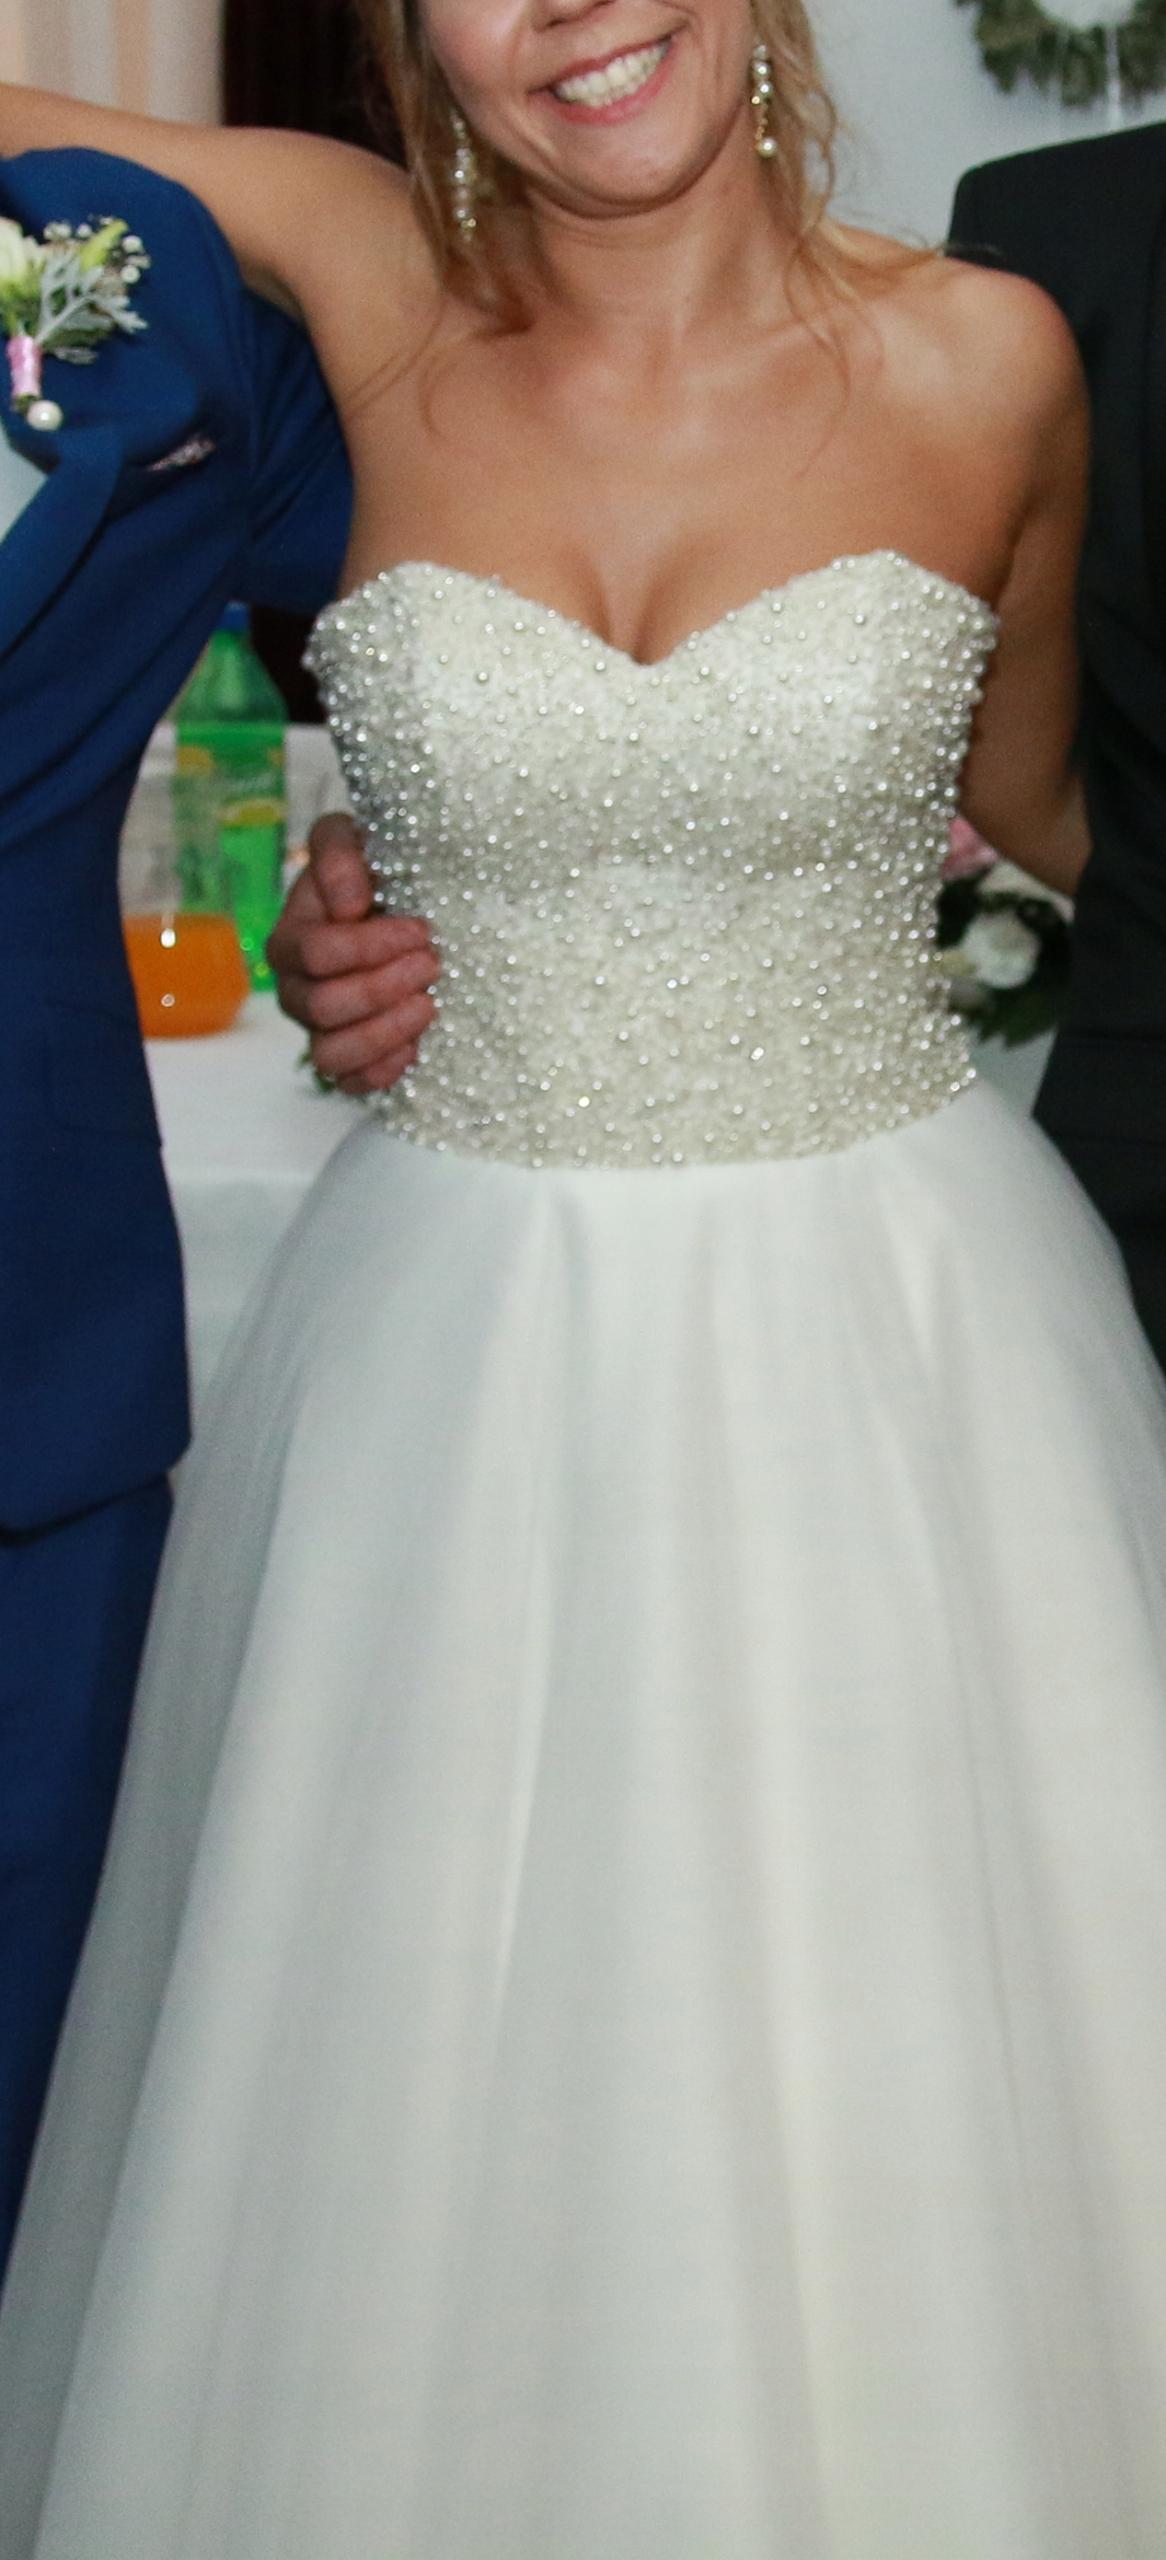 Suknia ślubna Perły Gorset 36 40 Princesska 7627348935 Oficjalne